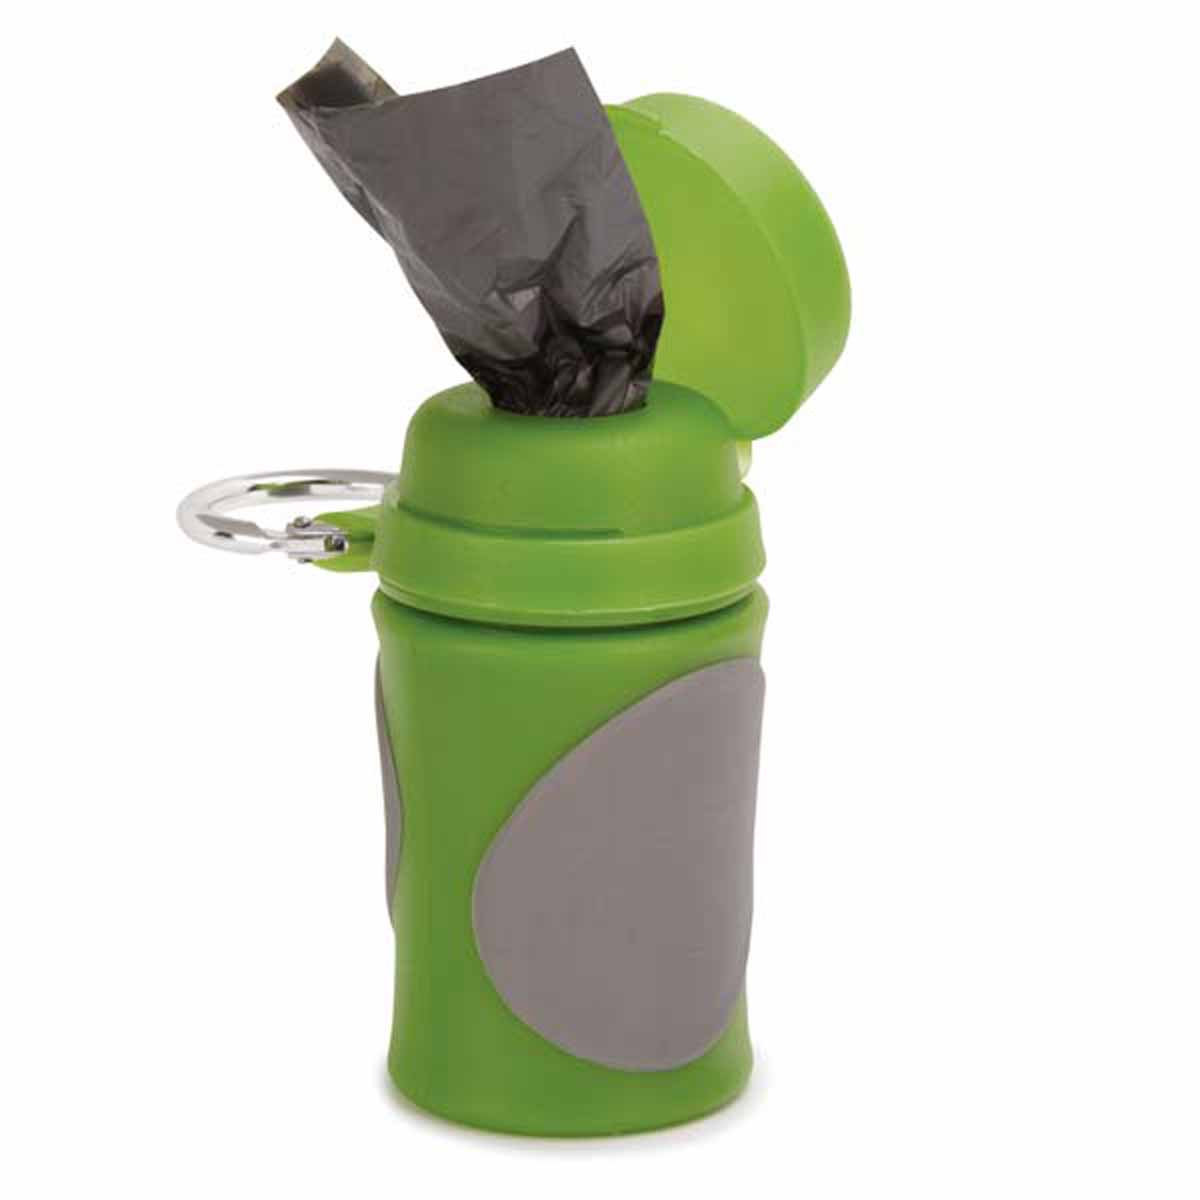 Clean Go Pet Axis Waste Bag Holder - Fern